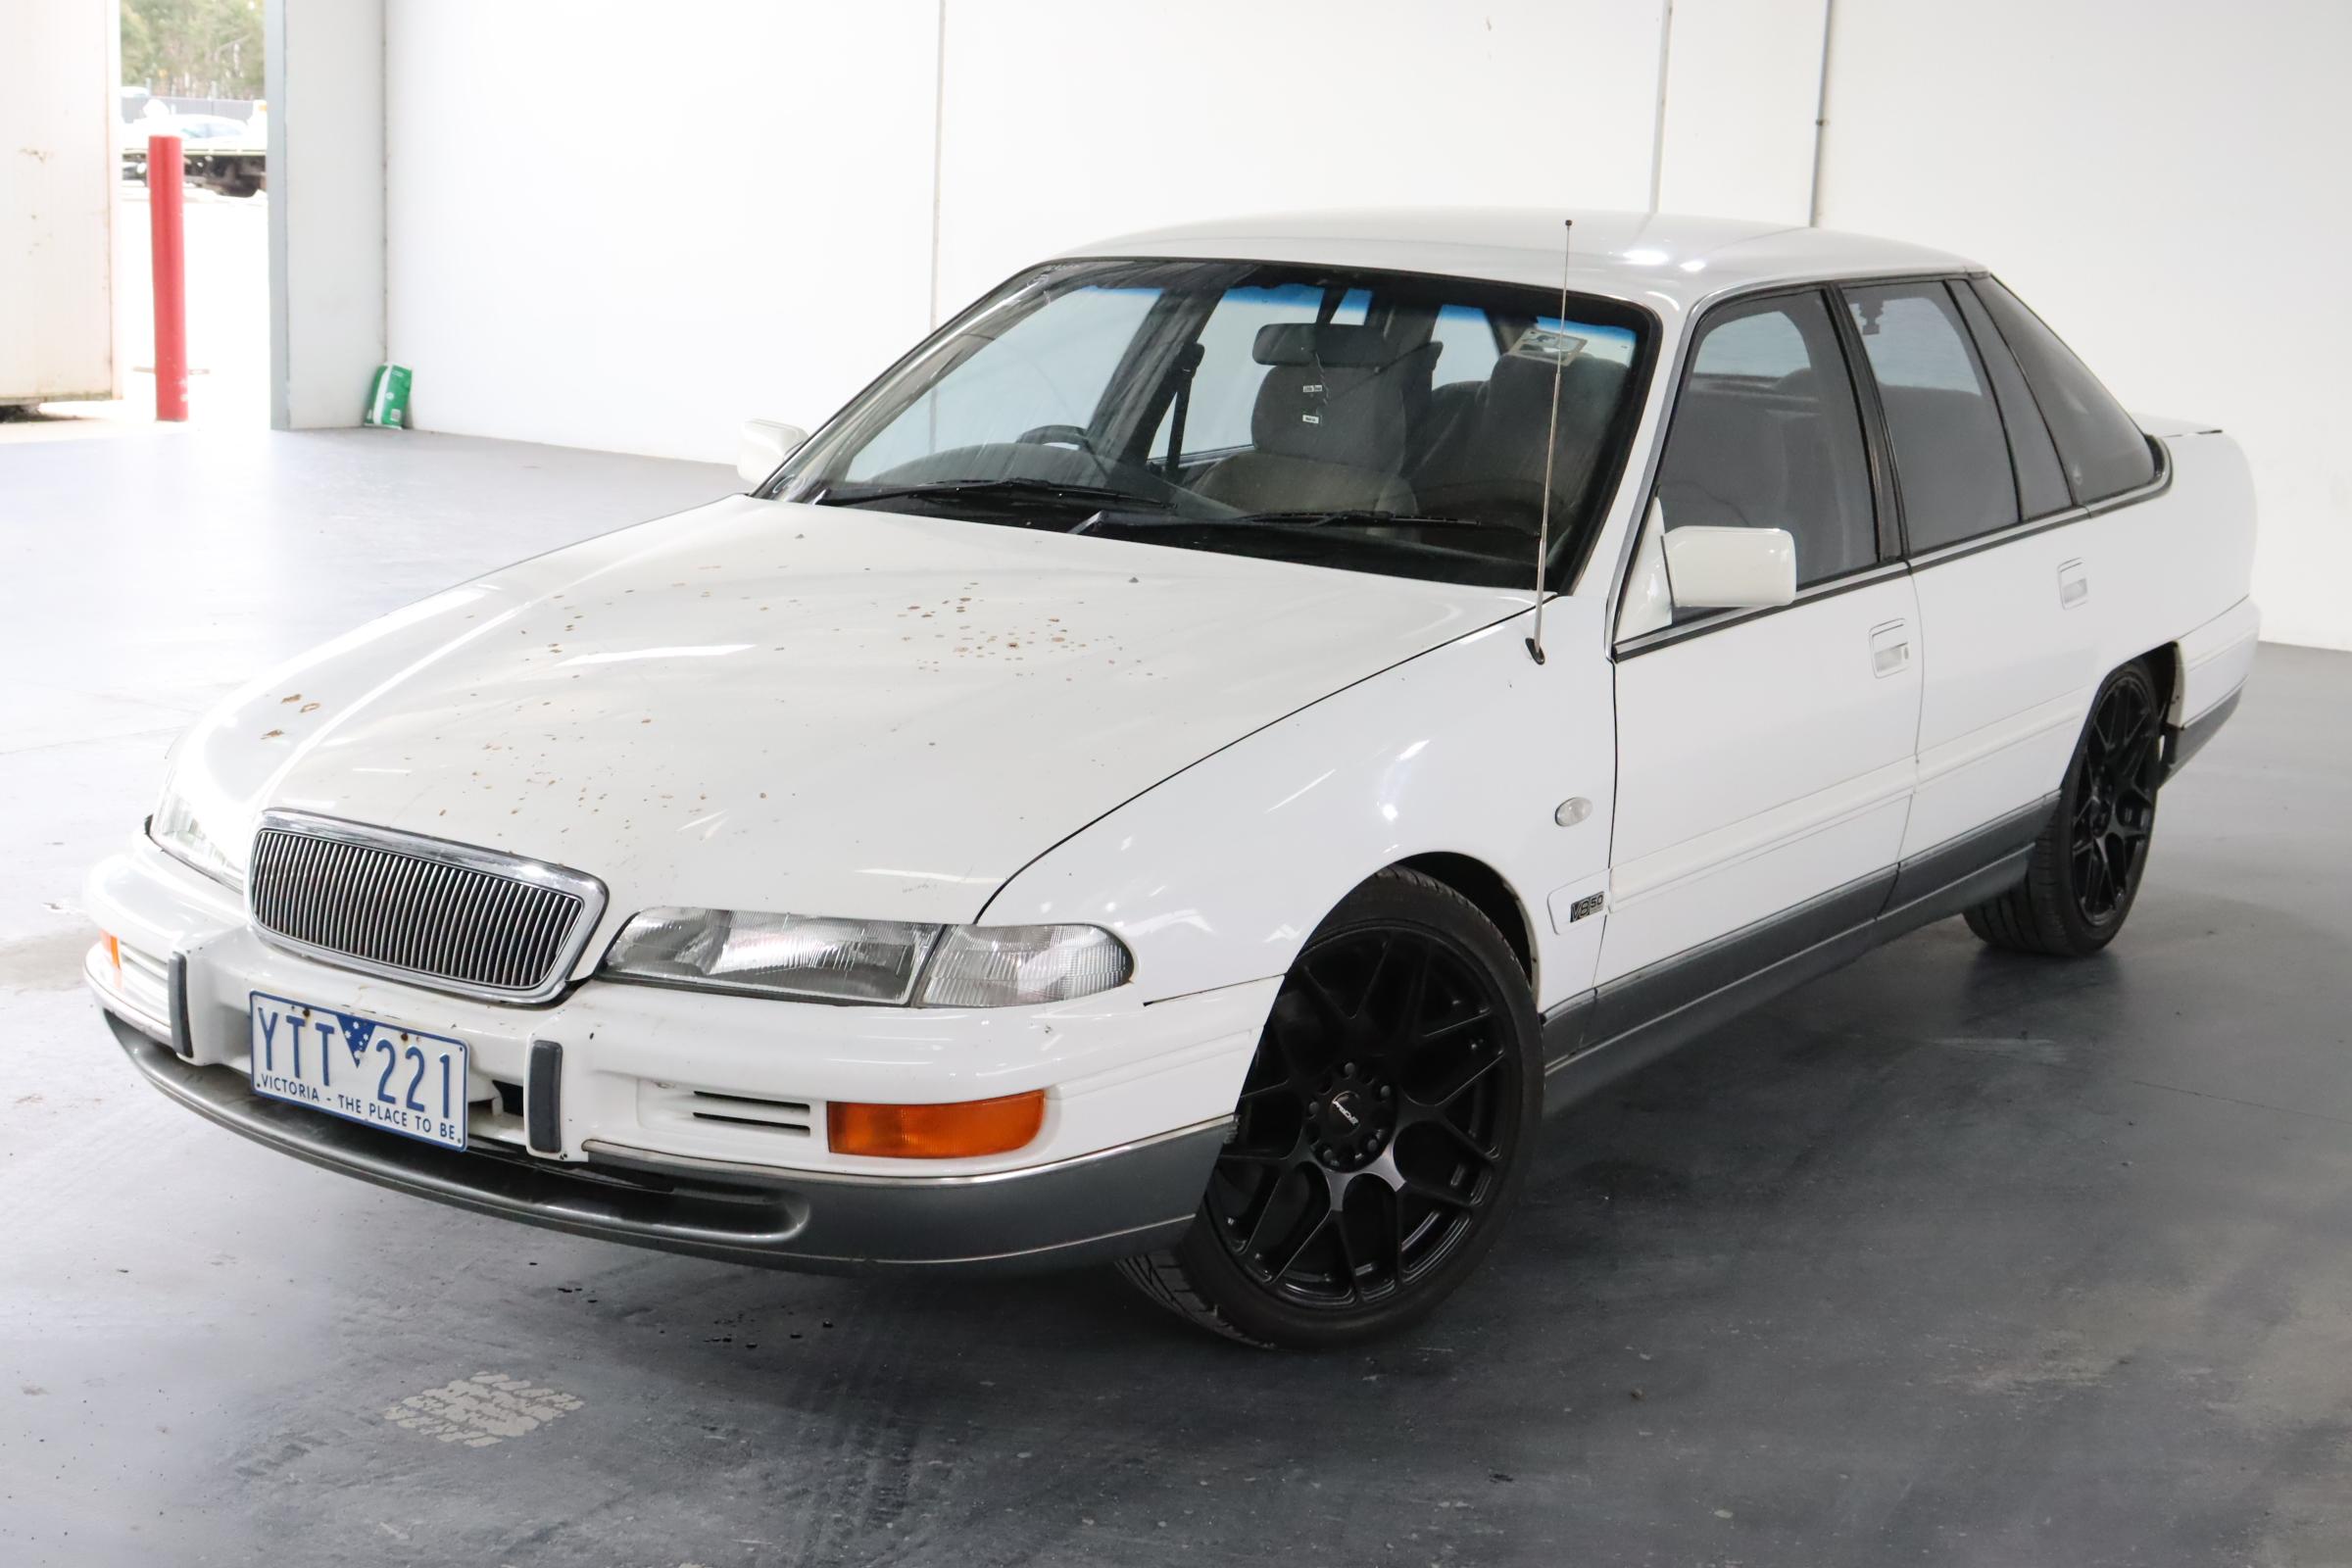 1994 Holden Statesman V8 VR Automatic Sedan